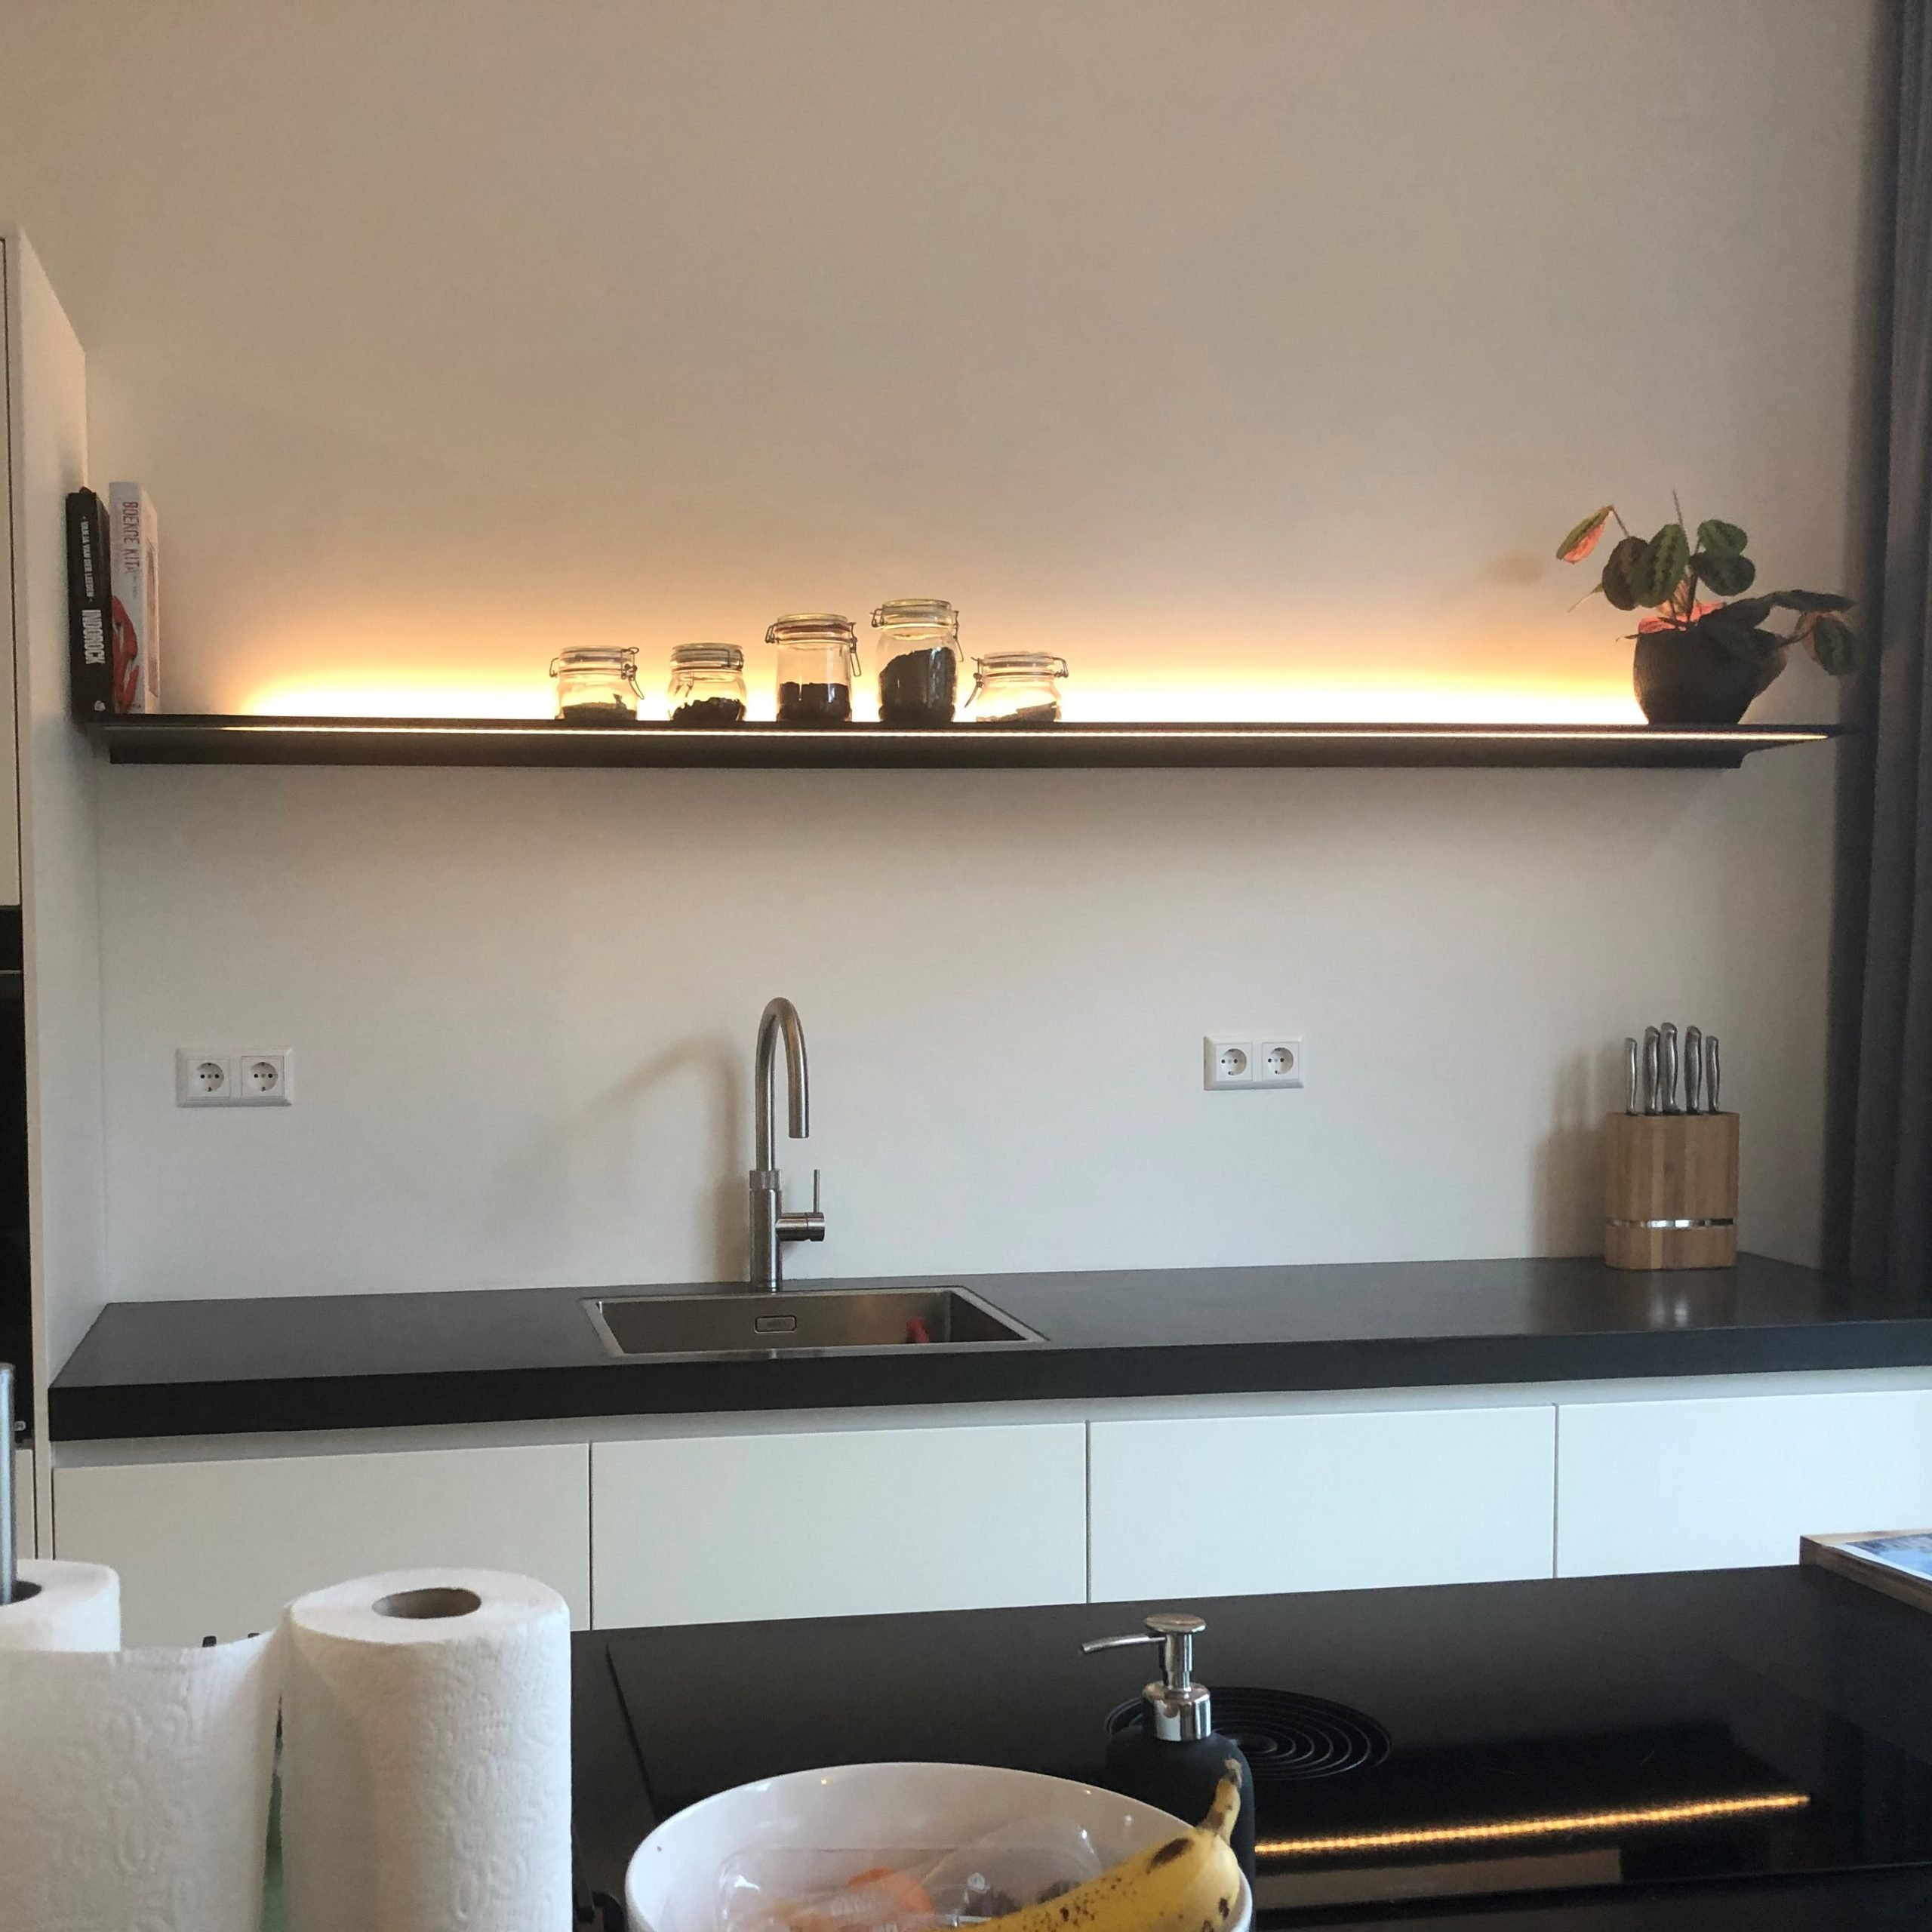 Wandlamp Shelf Gesture Control Premium